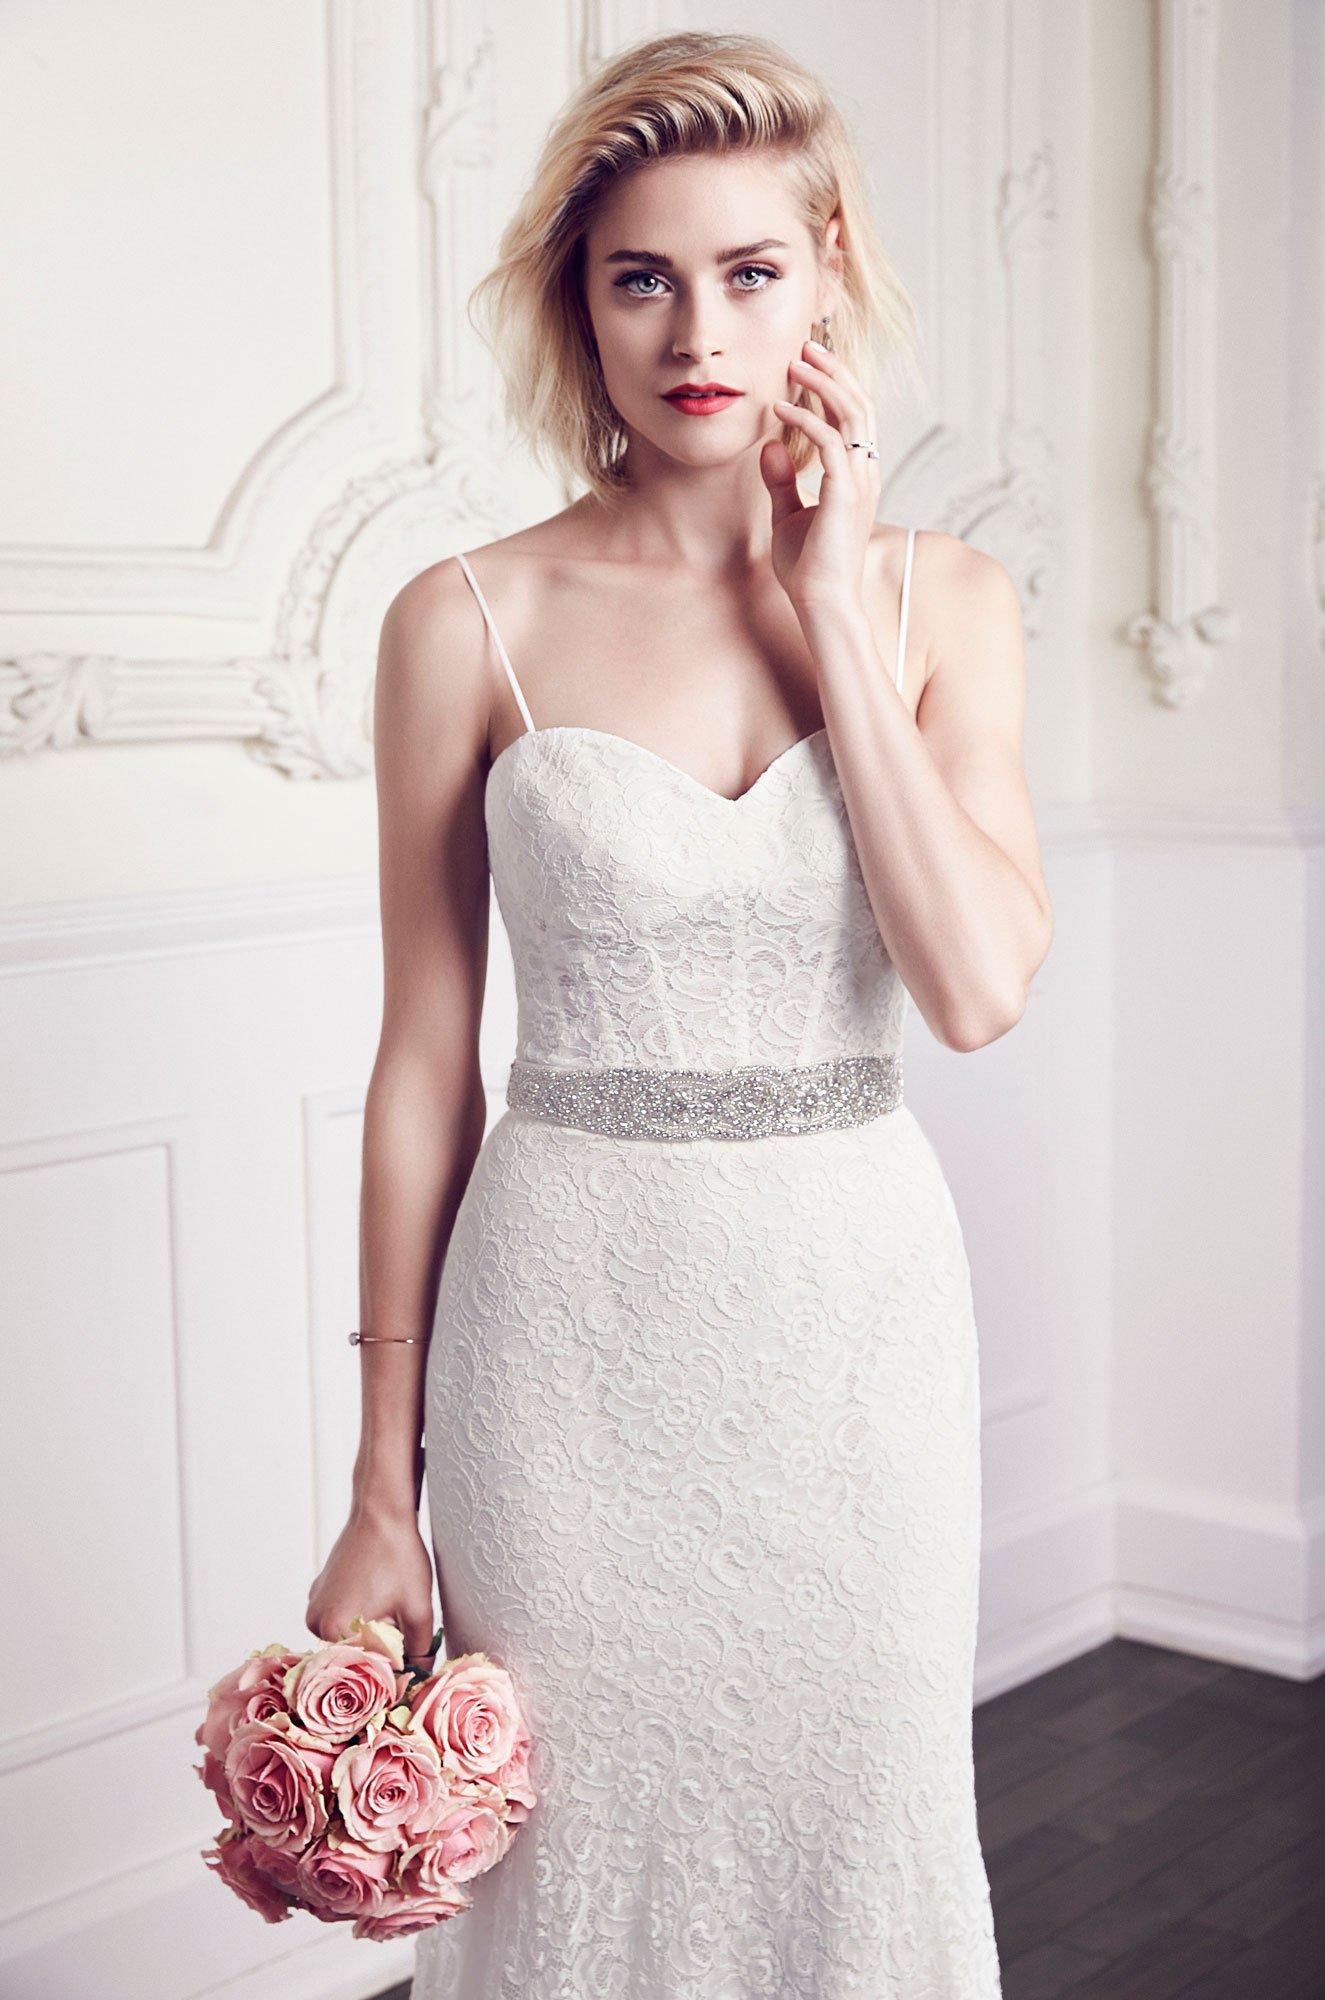 Corset Lace Wedding Dress - Style #1952 | Mikaella Bridal